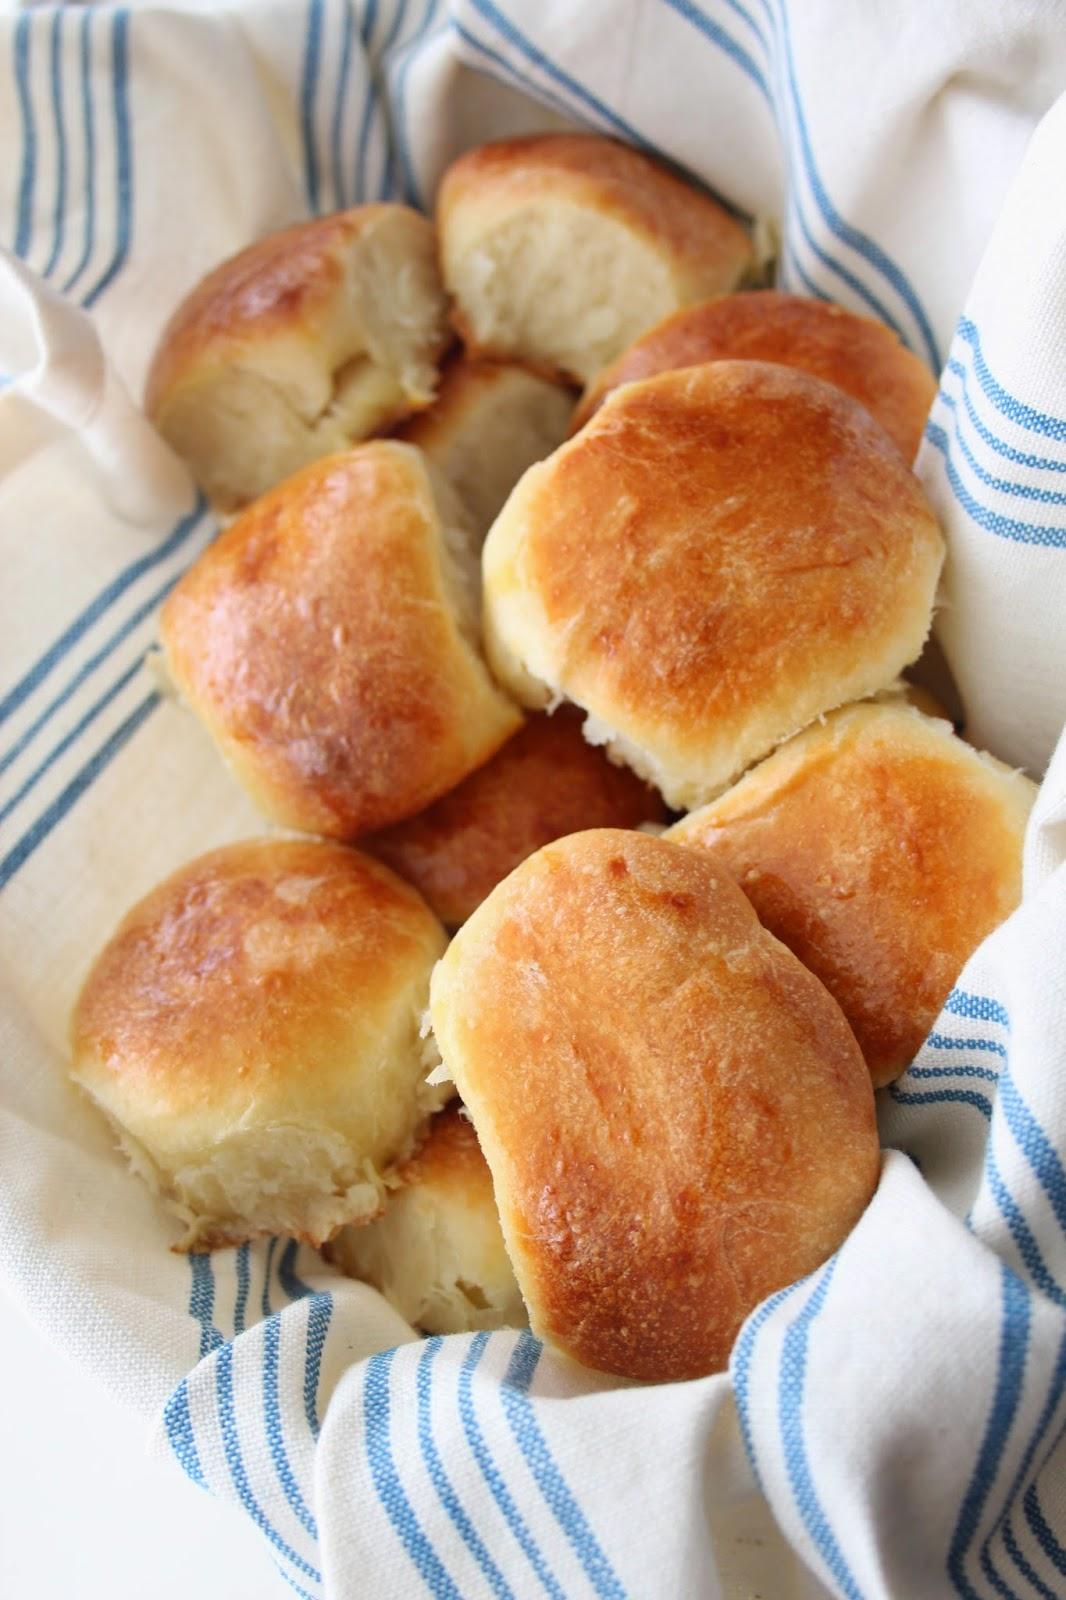 dinner rolls recipe http:///www.footnotesandfinds.com